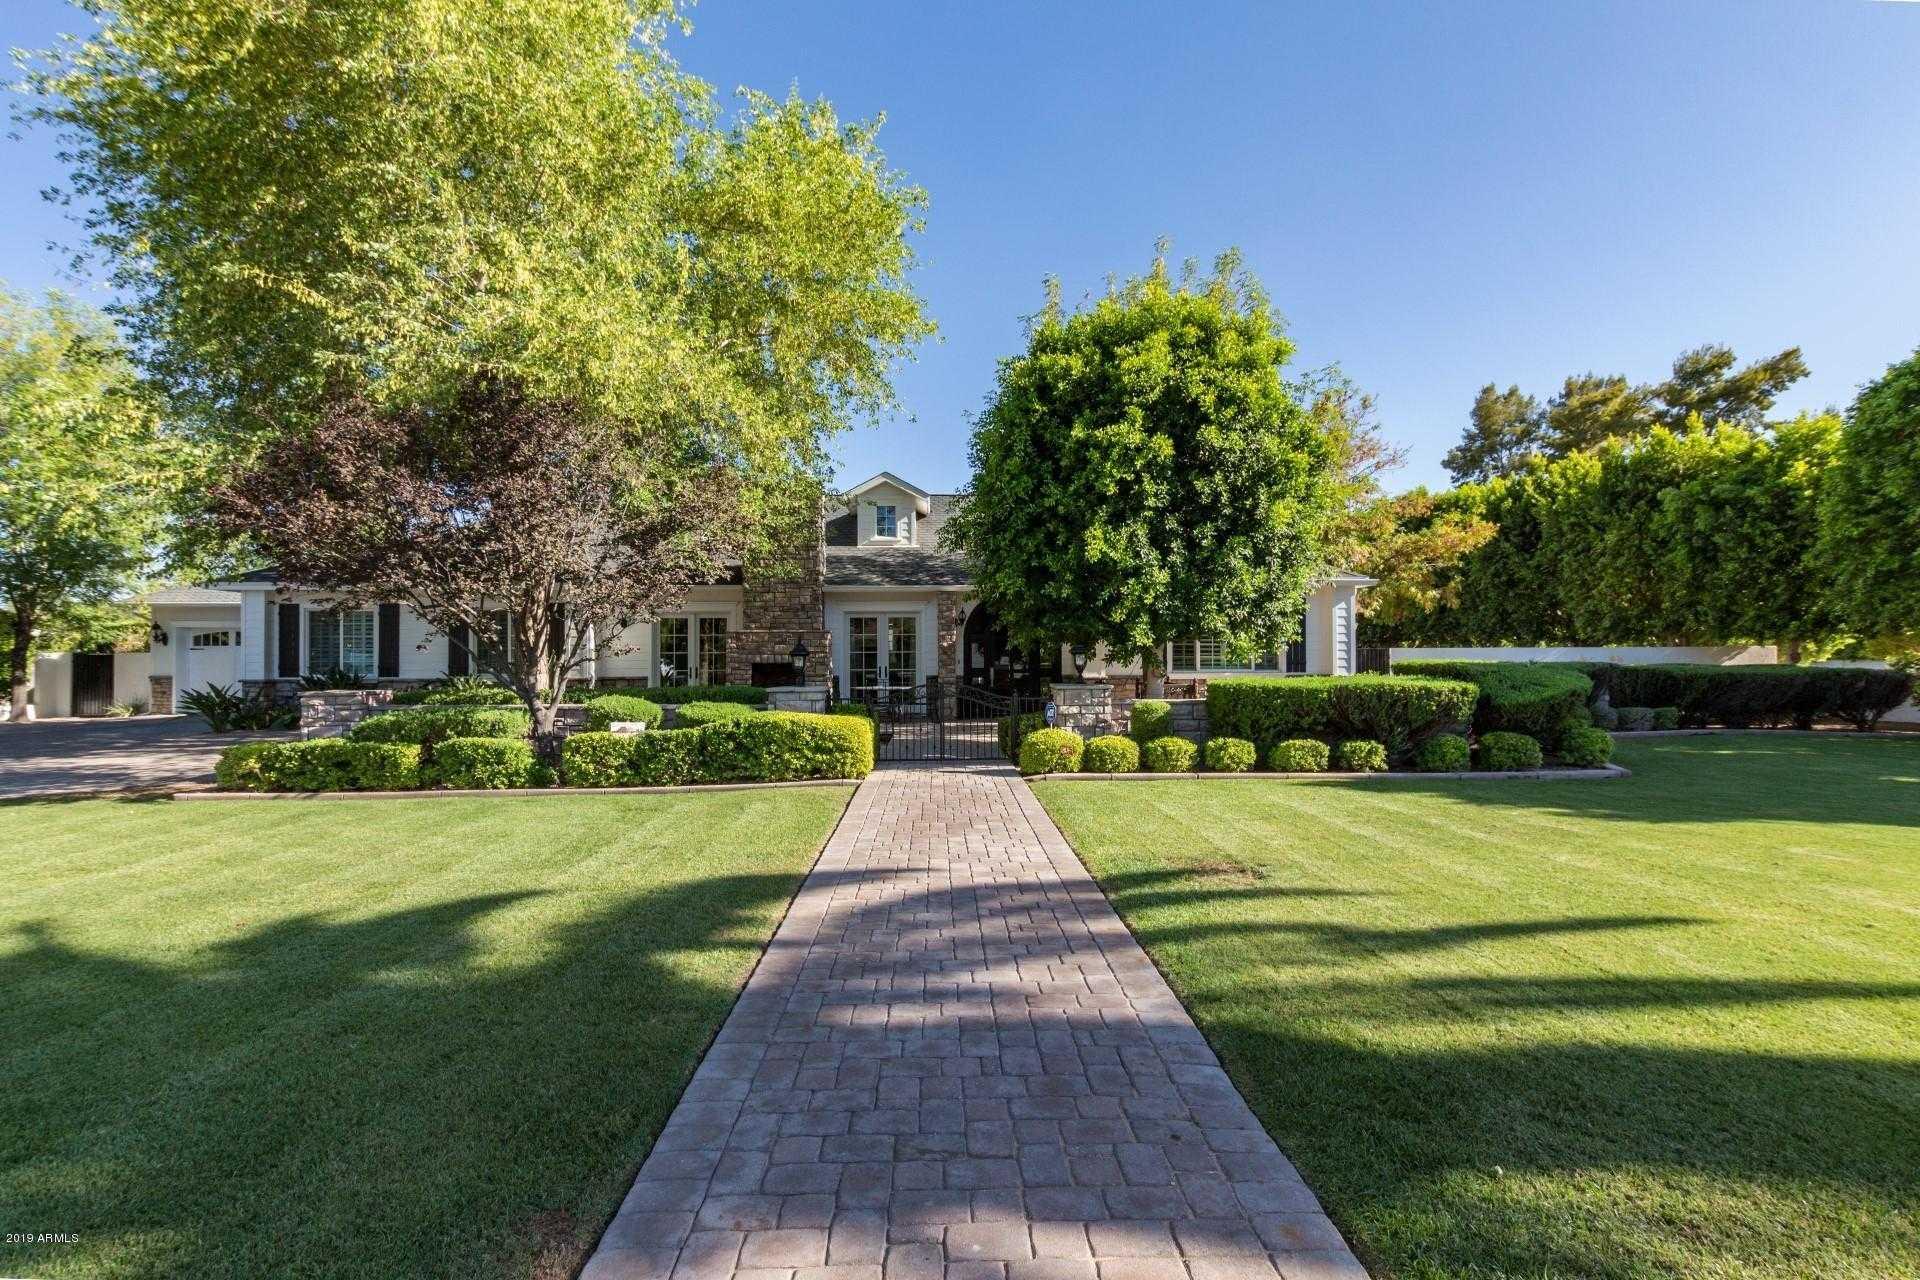 $2,350,000 - 5Br/4Ba - Home for Sale in Casa Linda 2, Phoenix